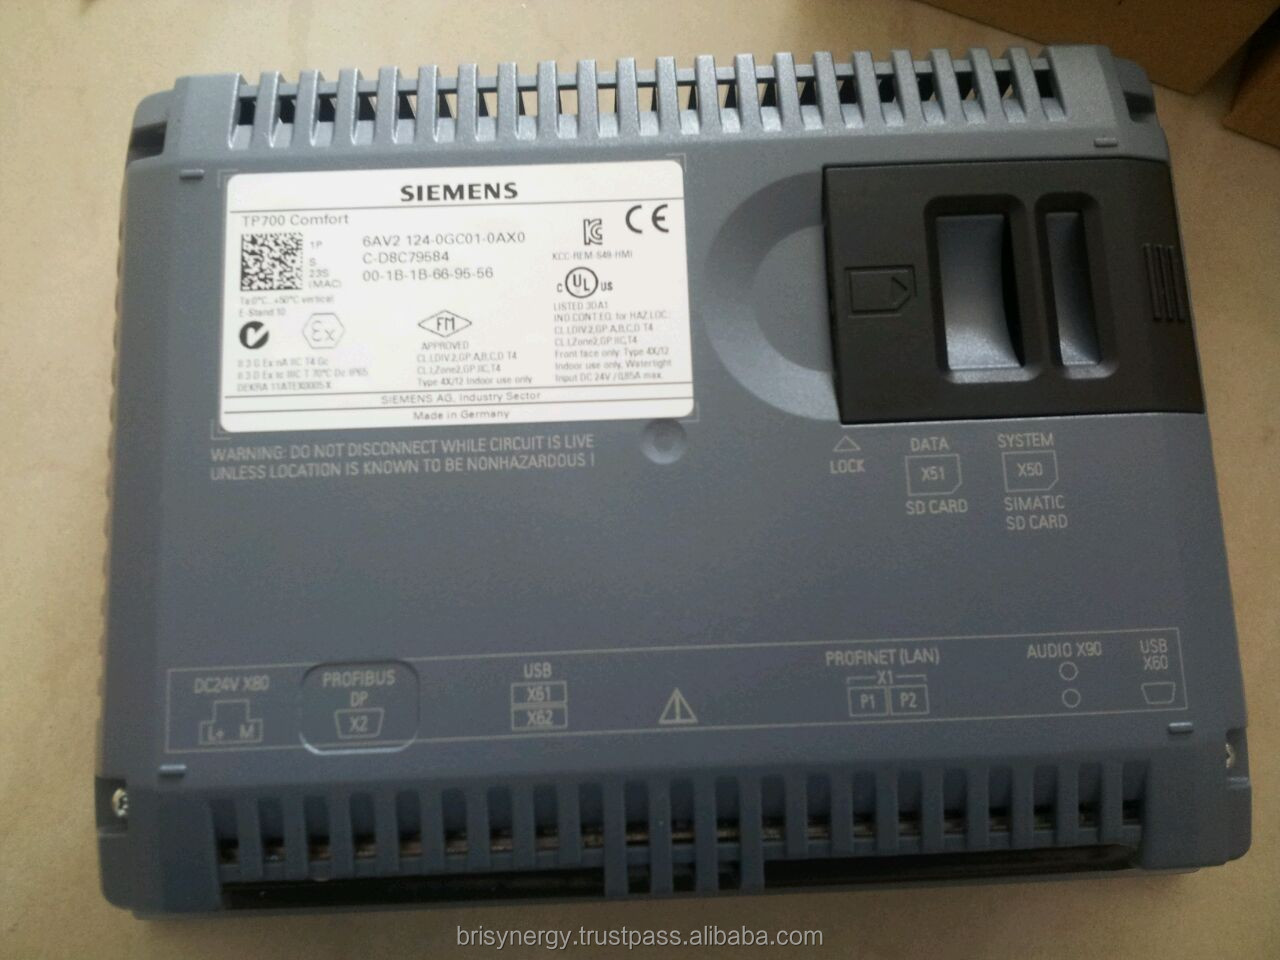 Siemens 7 Inch Hmi Human Machine Interface 6av2124 0gc01